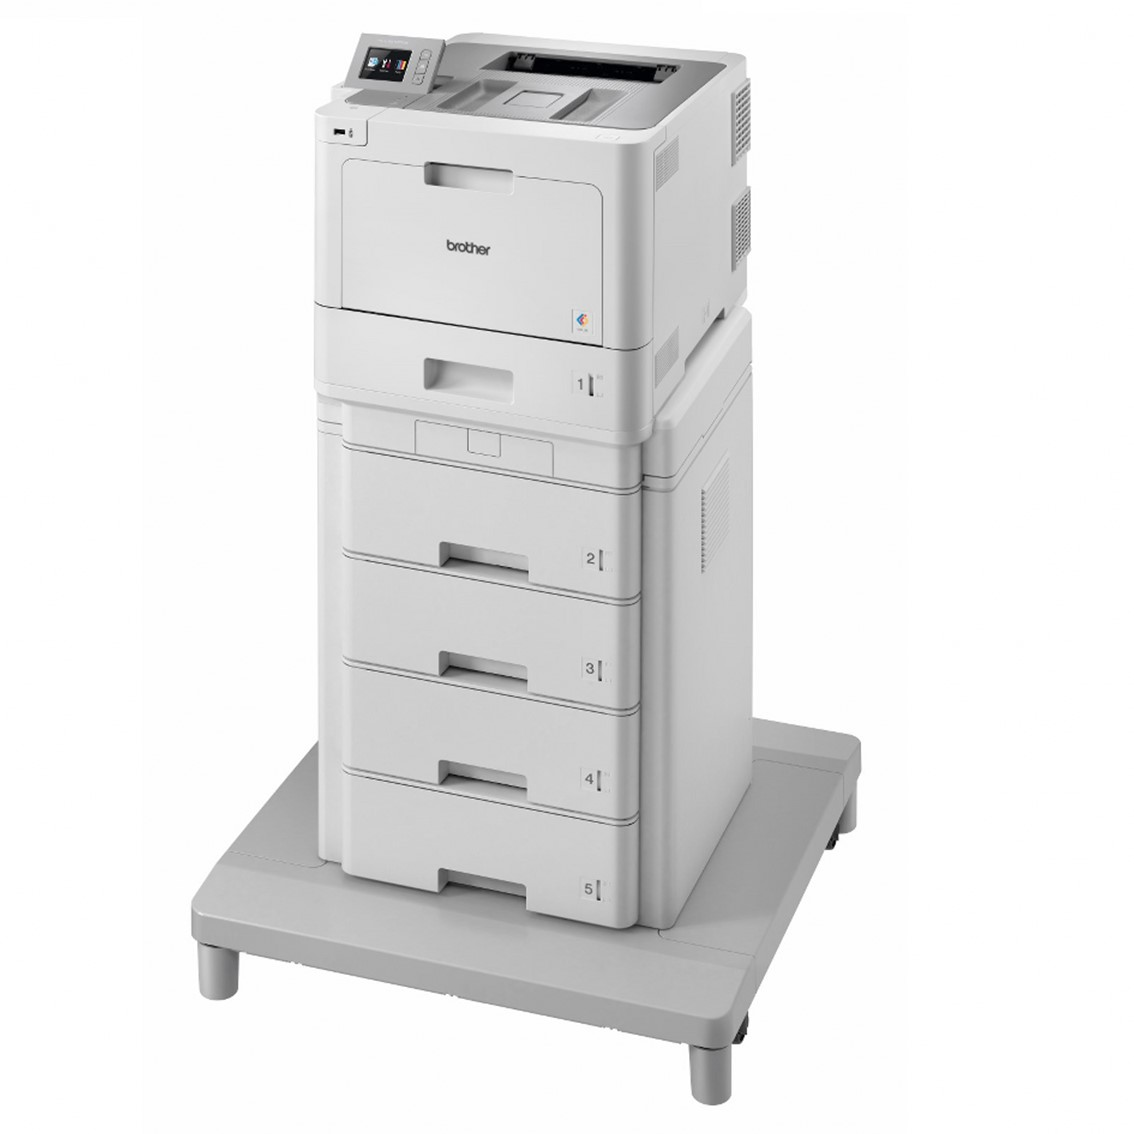 Impresora brother laser - led color hll9310cdw a4 -  31ppm -  1gb -  usb -  duplex impresion -  nfc -  wifi -  red cableada -  conectividad movil - capacidad de 2380 hojas -  4 toners de 6500 pag in